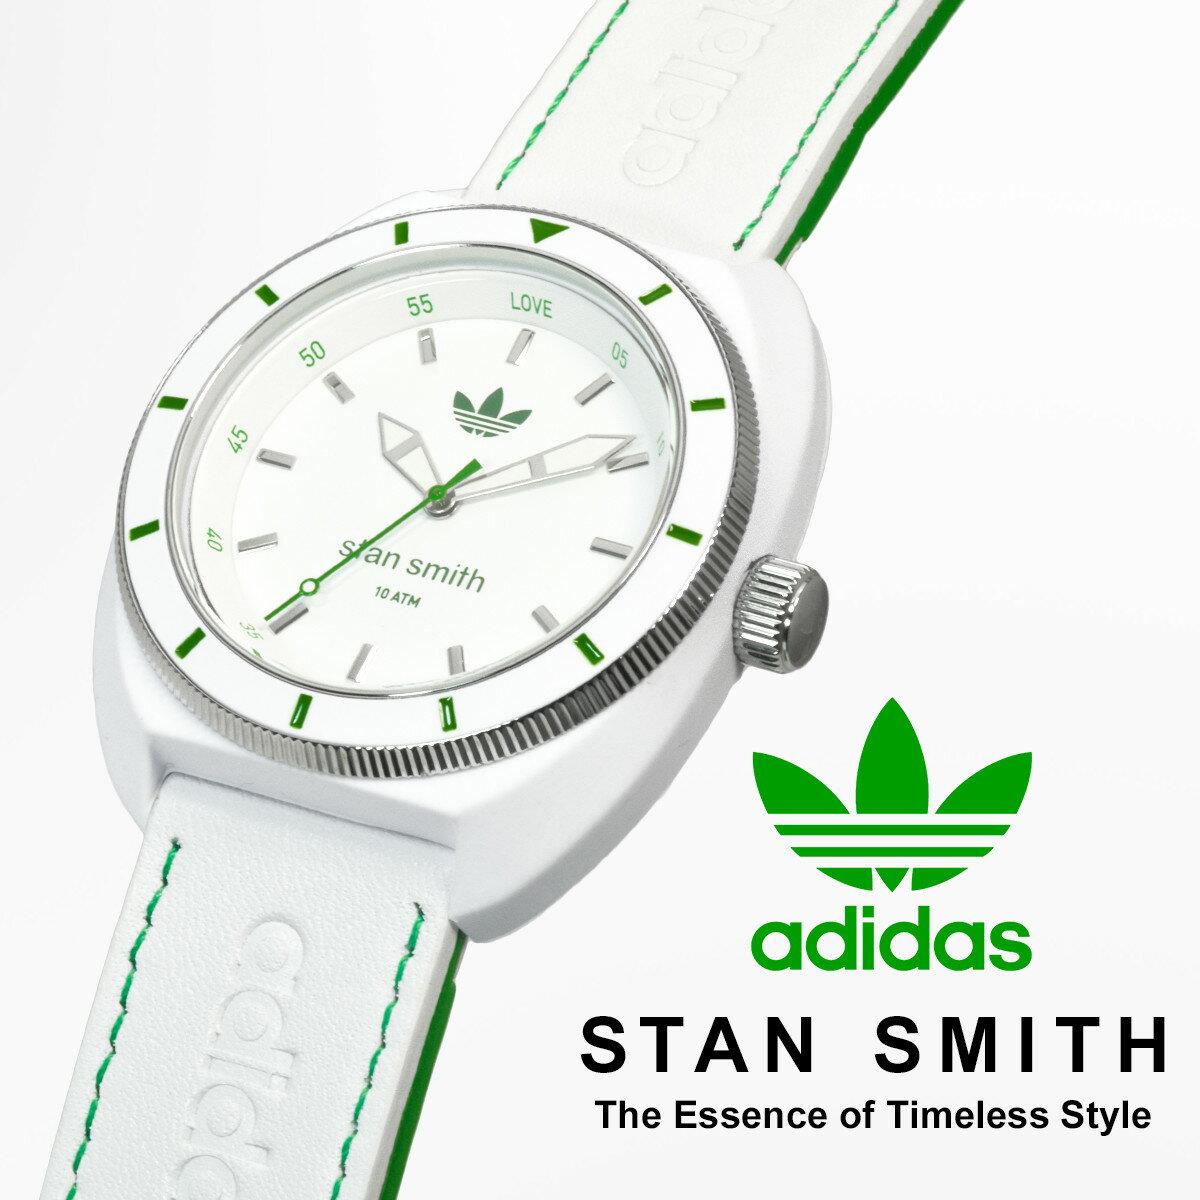 ADH2931 スタンスミス STAN SMITH アディダス オリジナルス adidas originals 腕時計 メンズ レディース スポーツ [海外正規店商品]